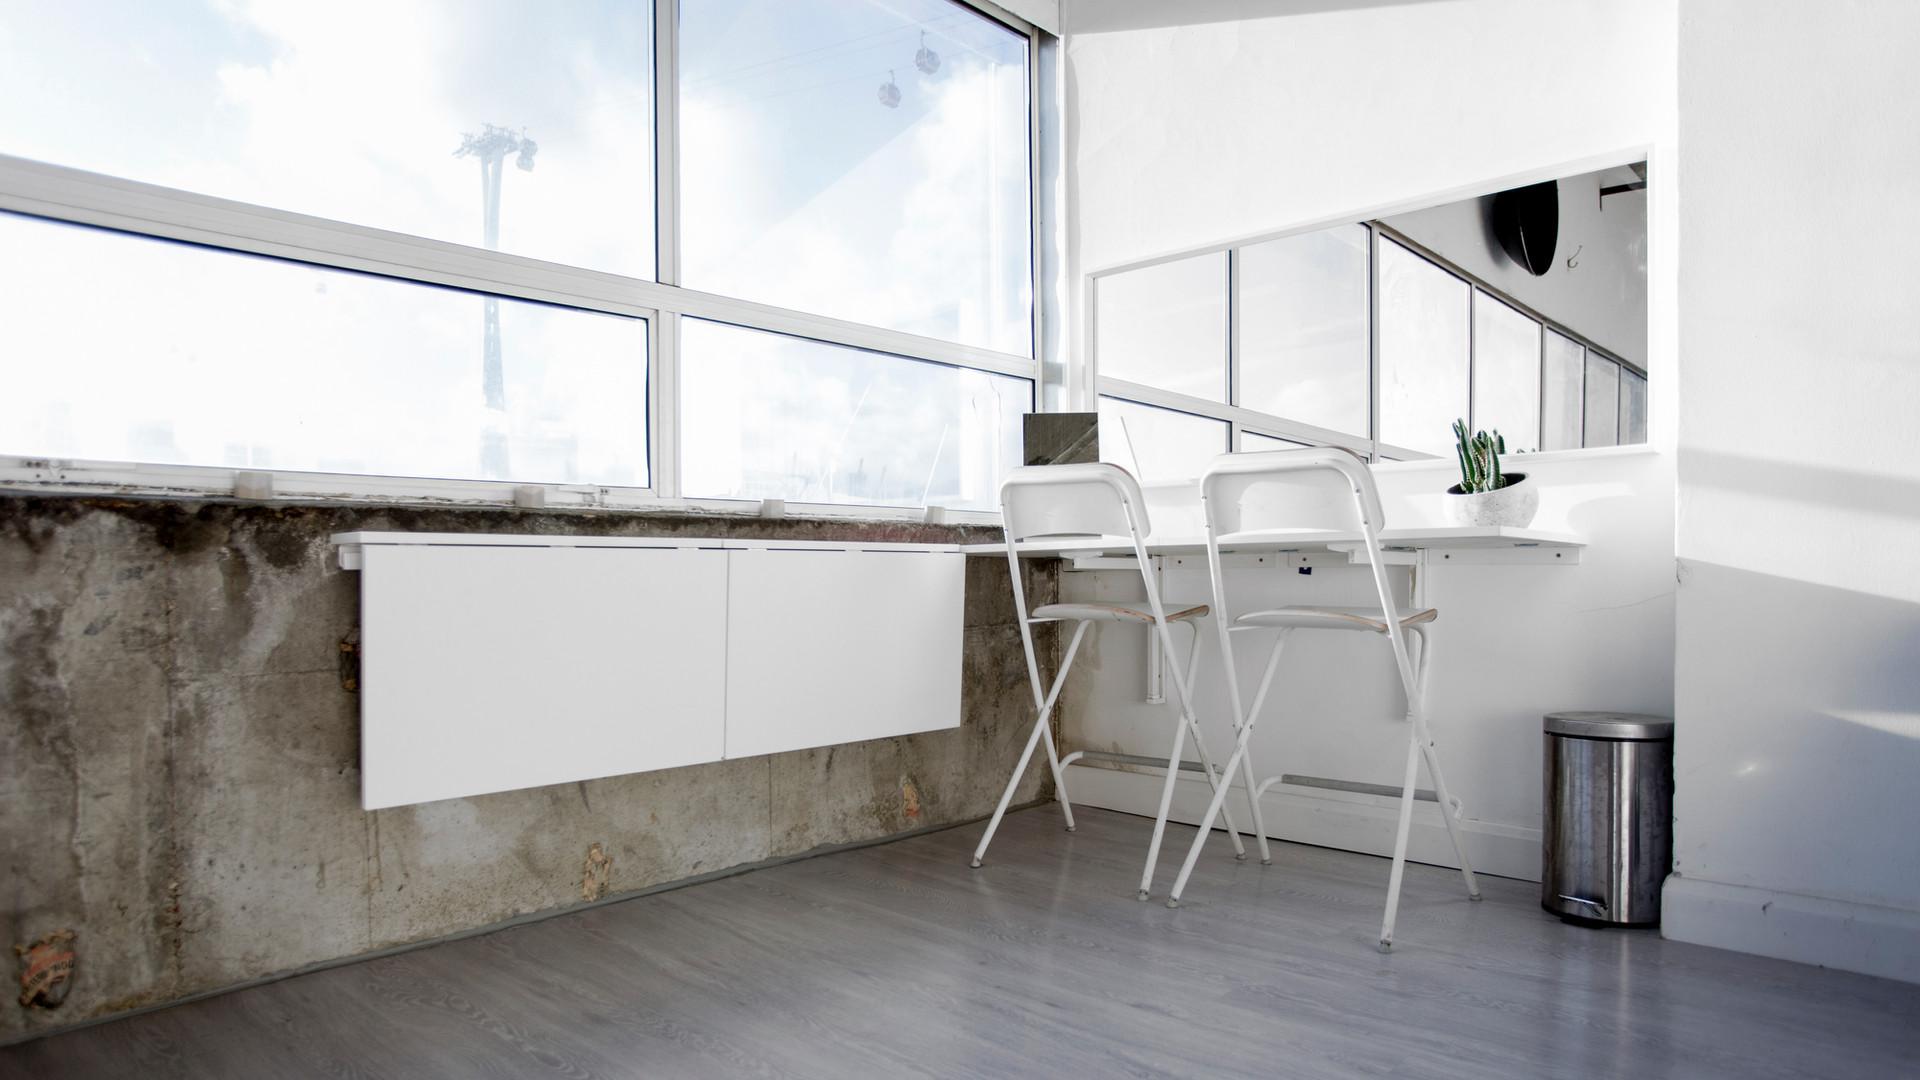 photography-studio-hire-daylight-silverspace-studios-4